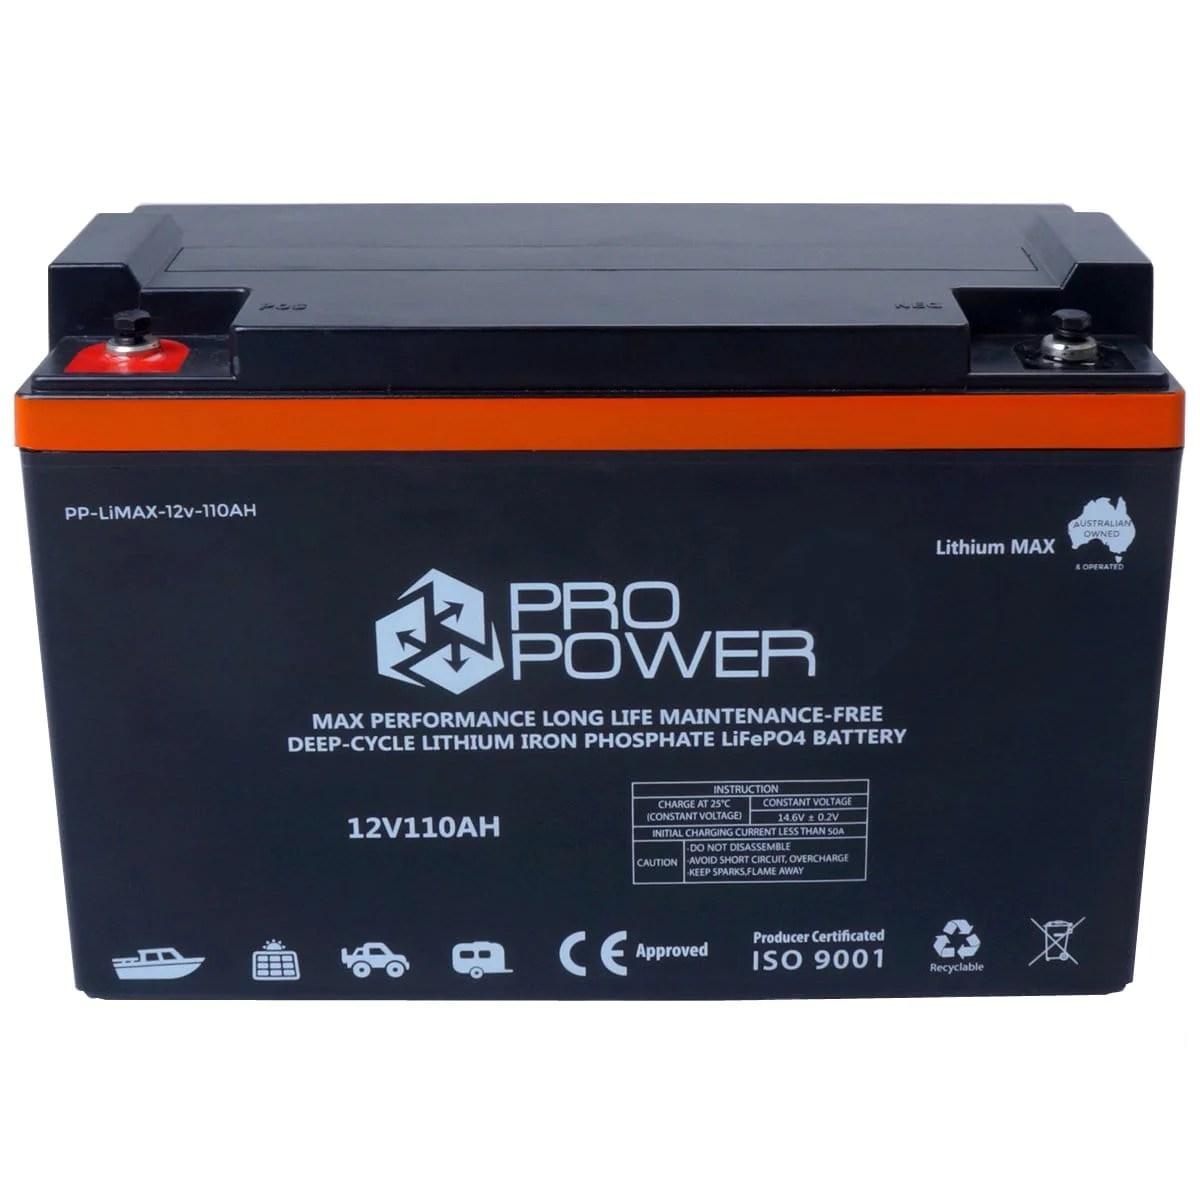 hight resolution of pro power 12v 110ah lithium iron lifepo4 deep cycle battery solar 4wd caravan